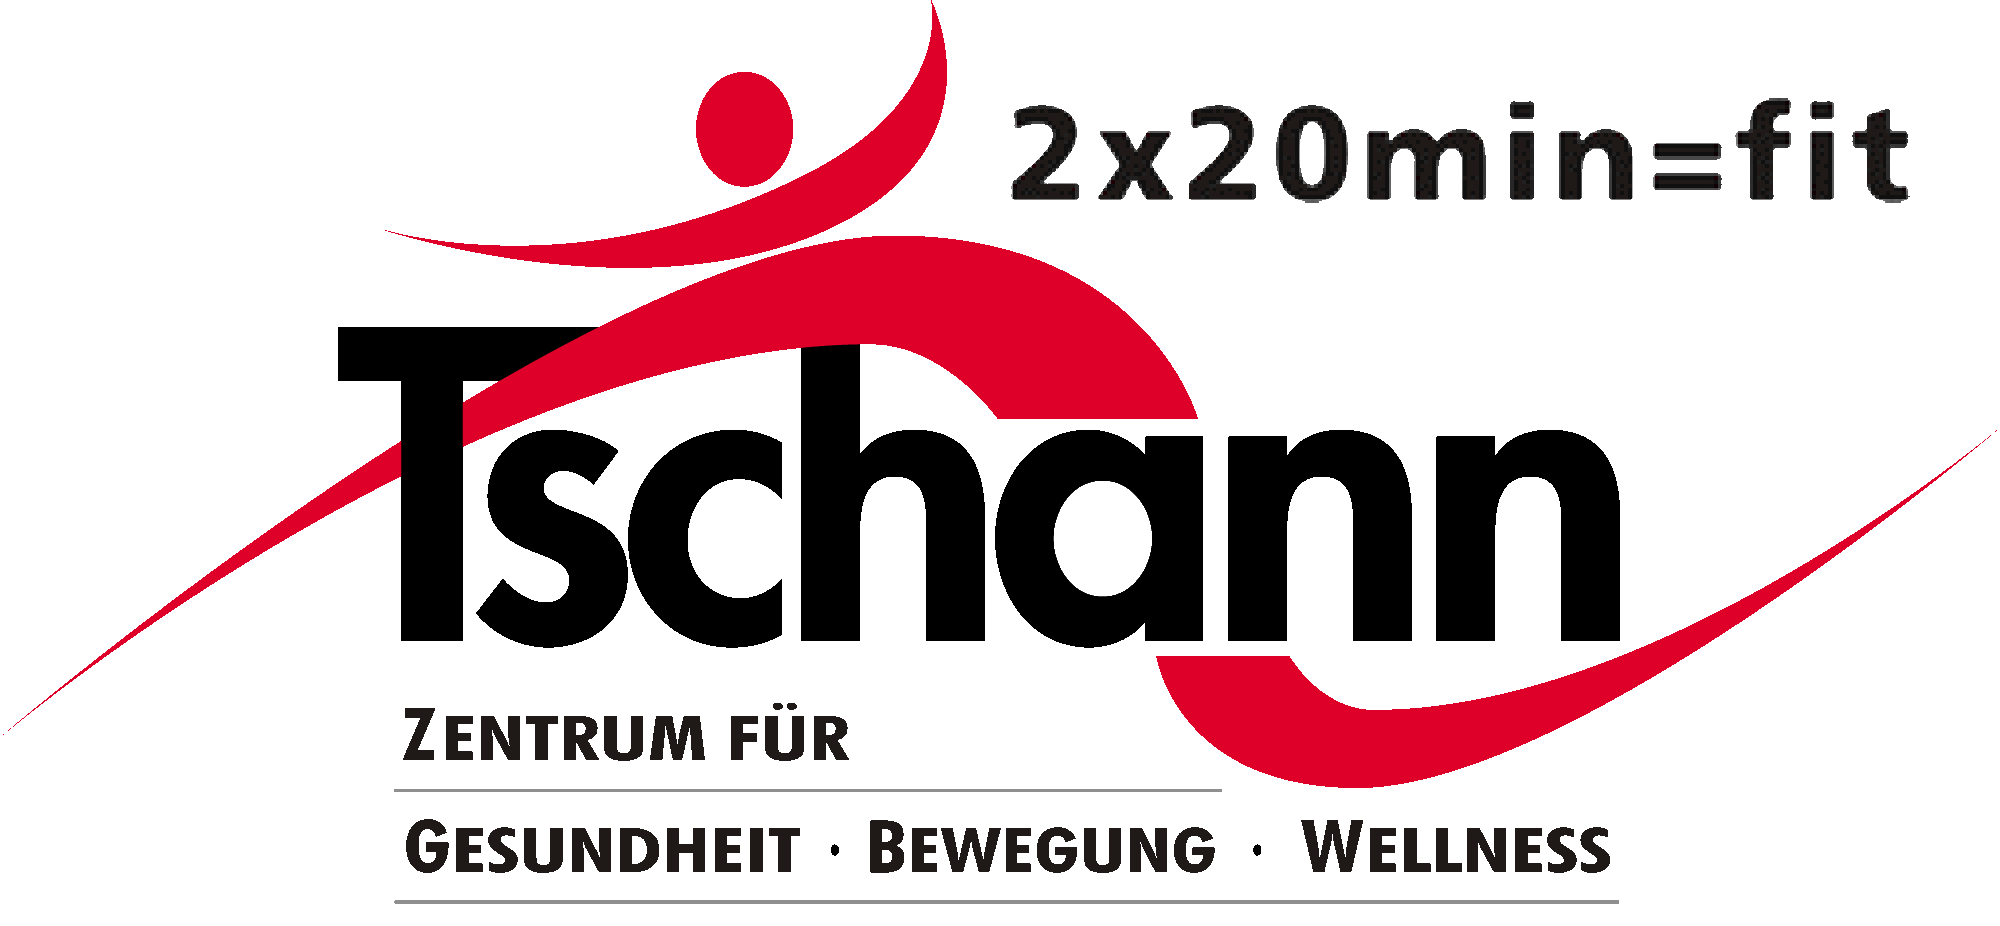 Tschann GmbH Gesundheitszentrum Tschann